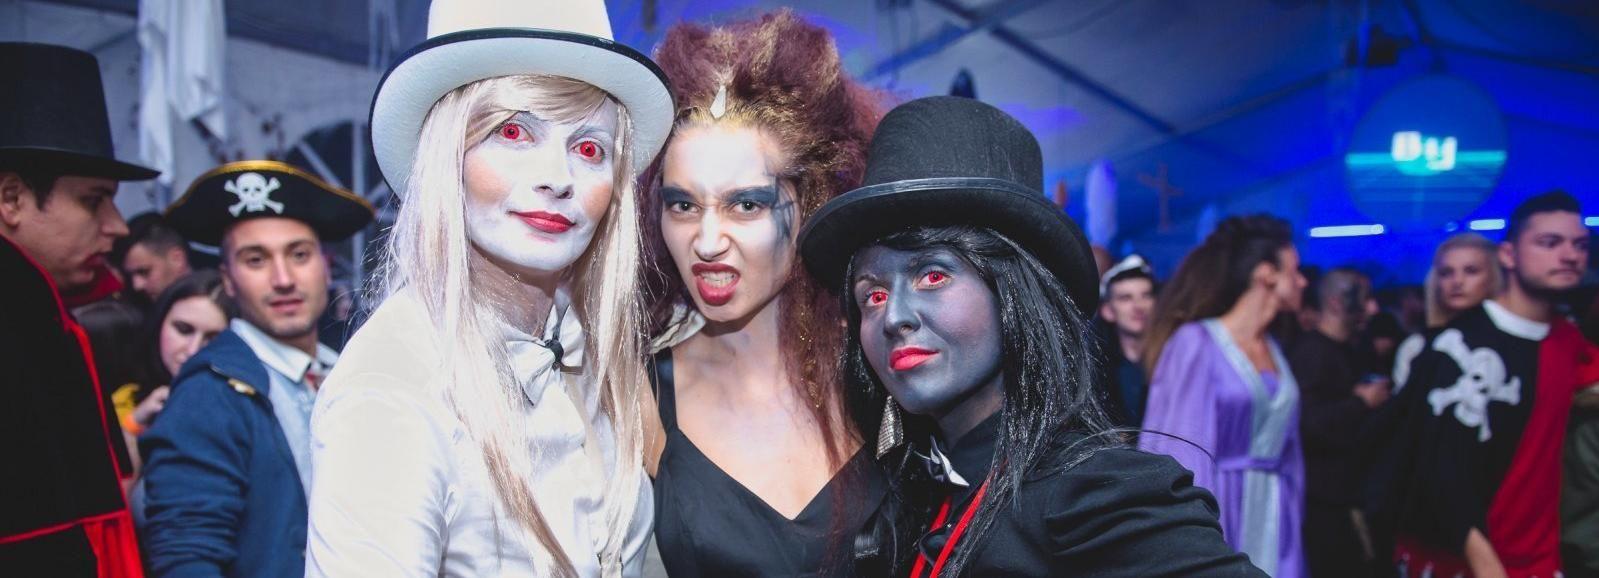 Transylvania Bran Castle 2–Day Halloween Party